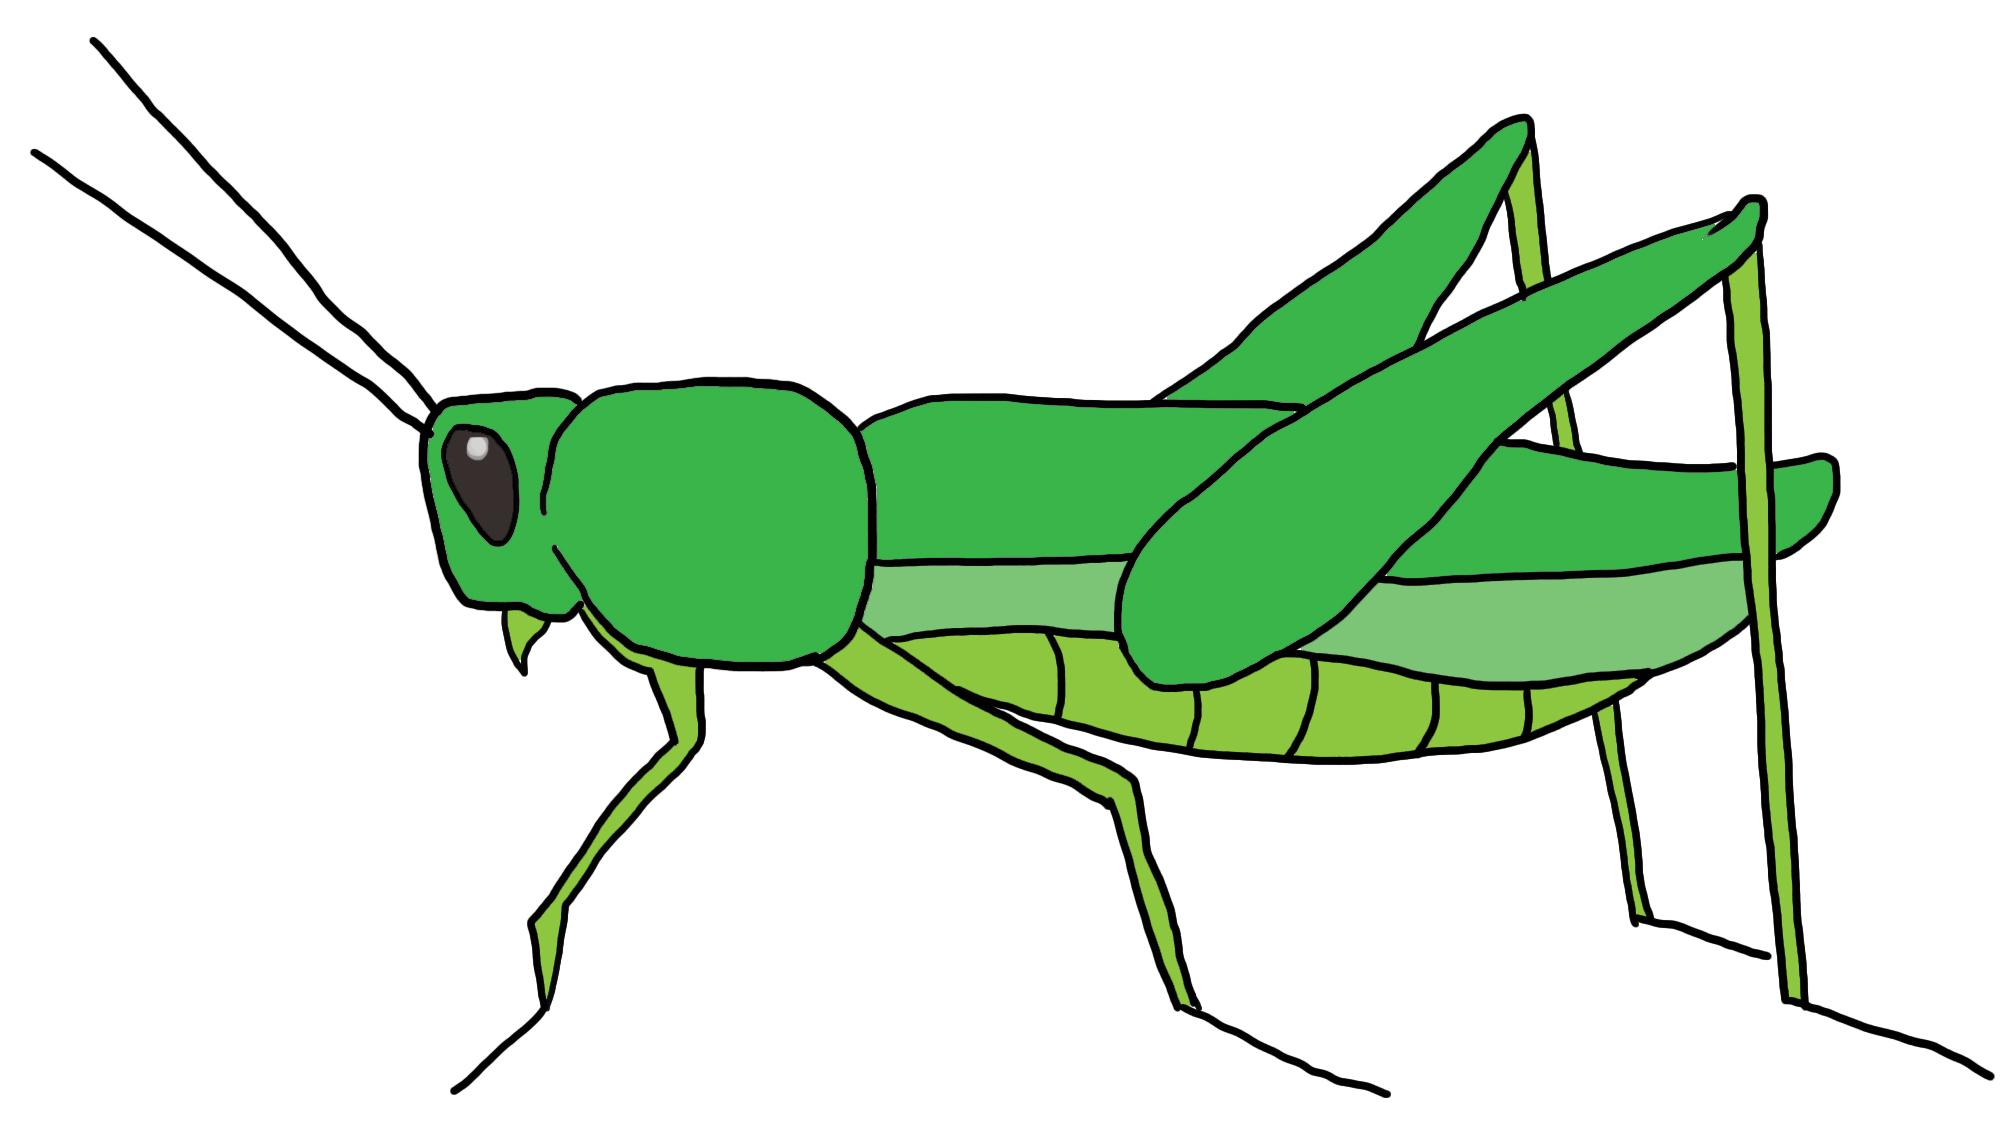 grasshopper%20drawing%20outline